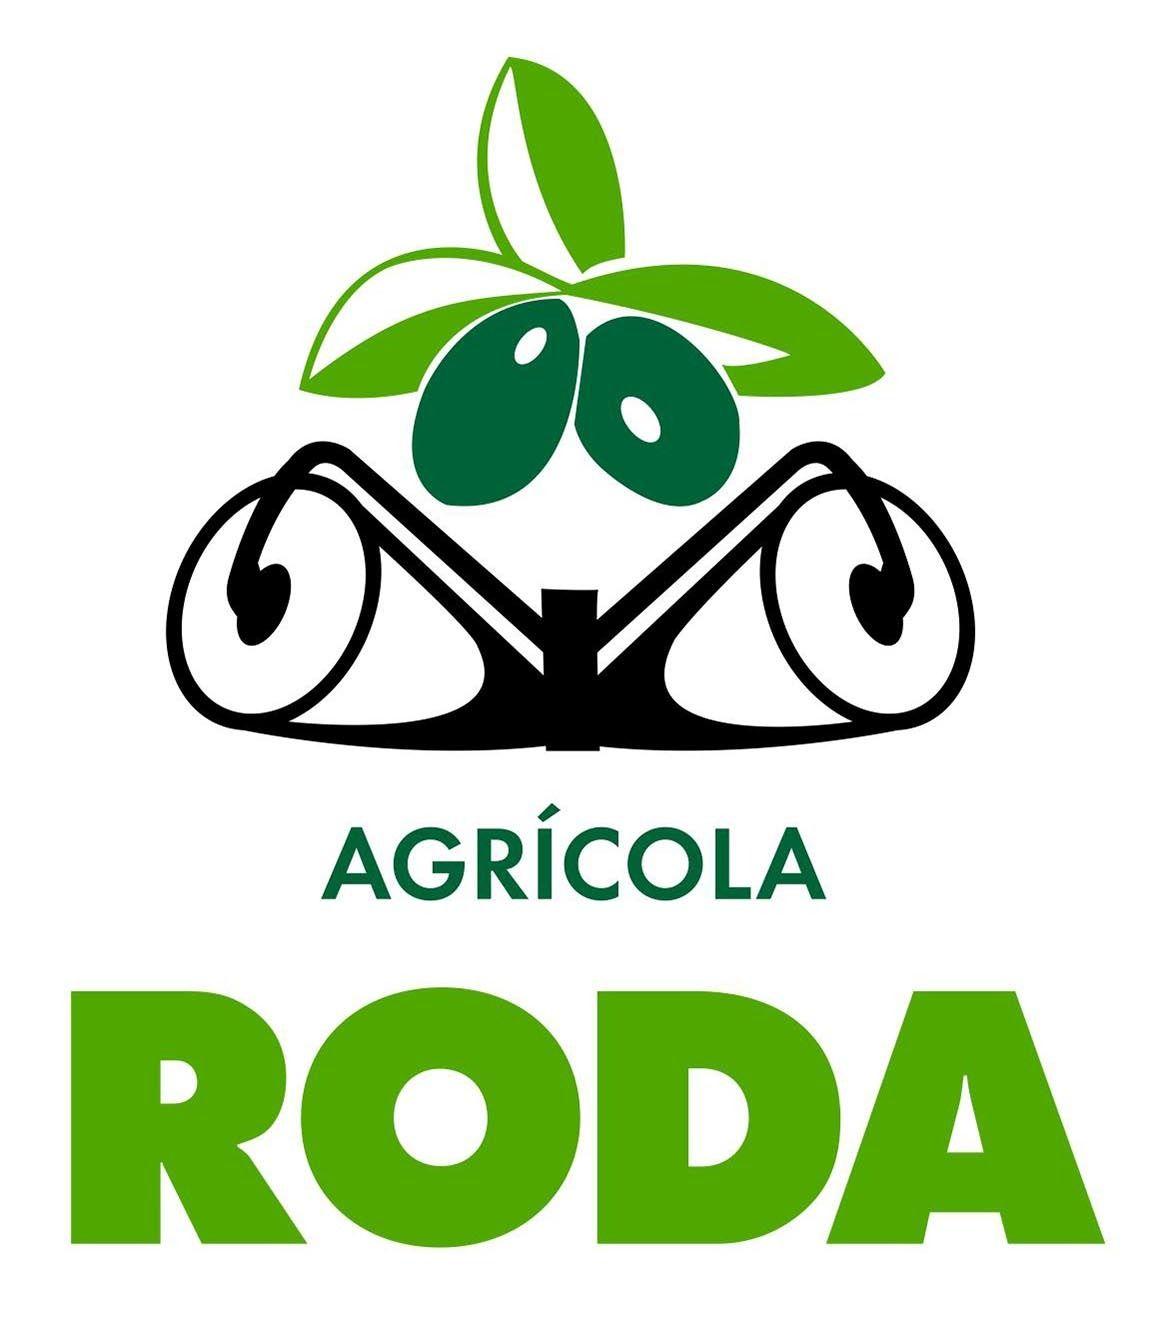 cooperativa agrícola roda